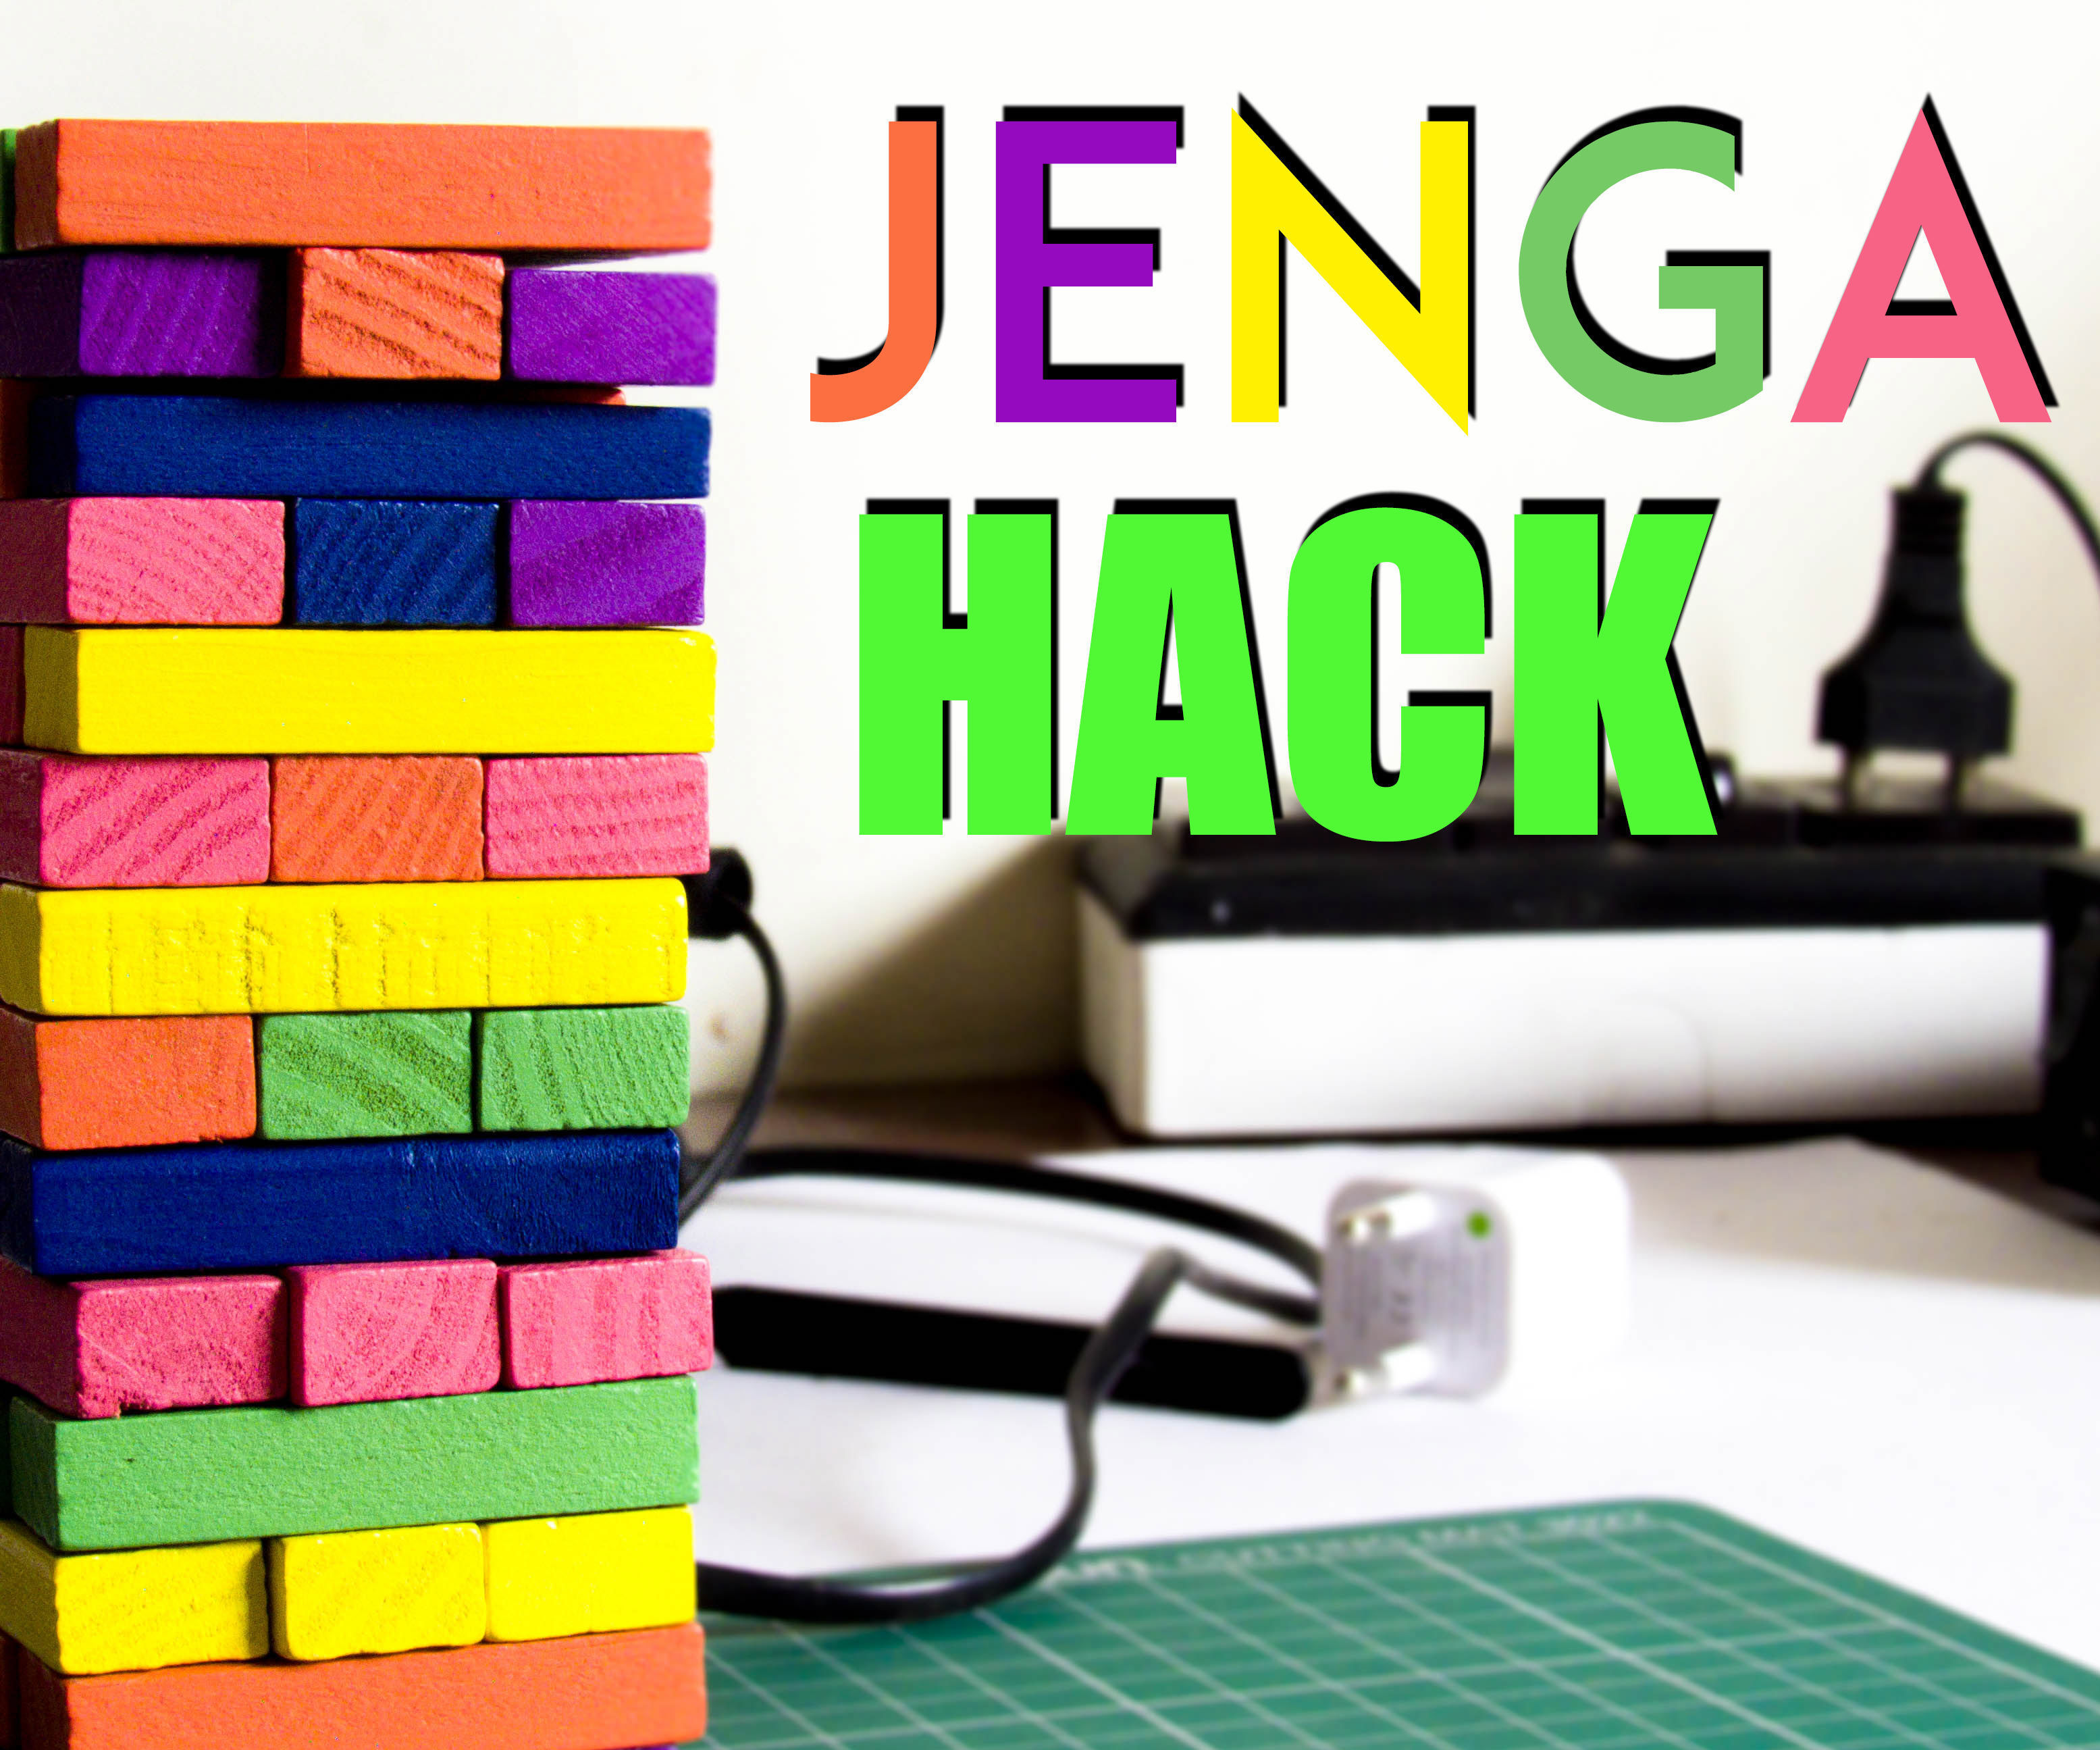 The JENGA Hack